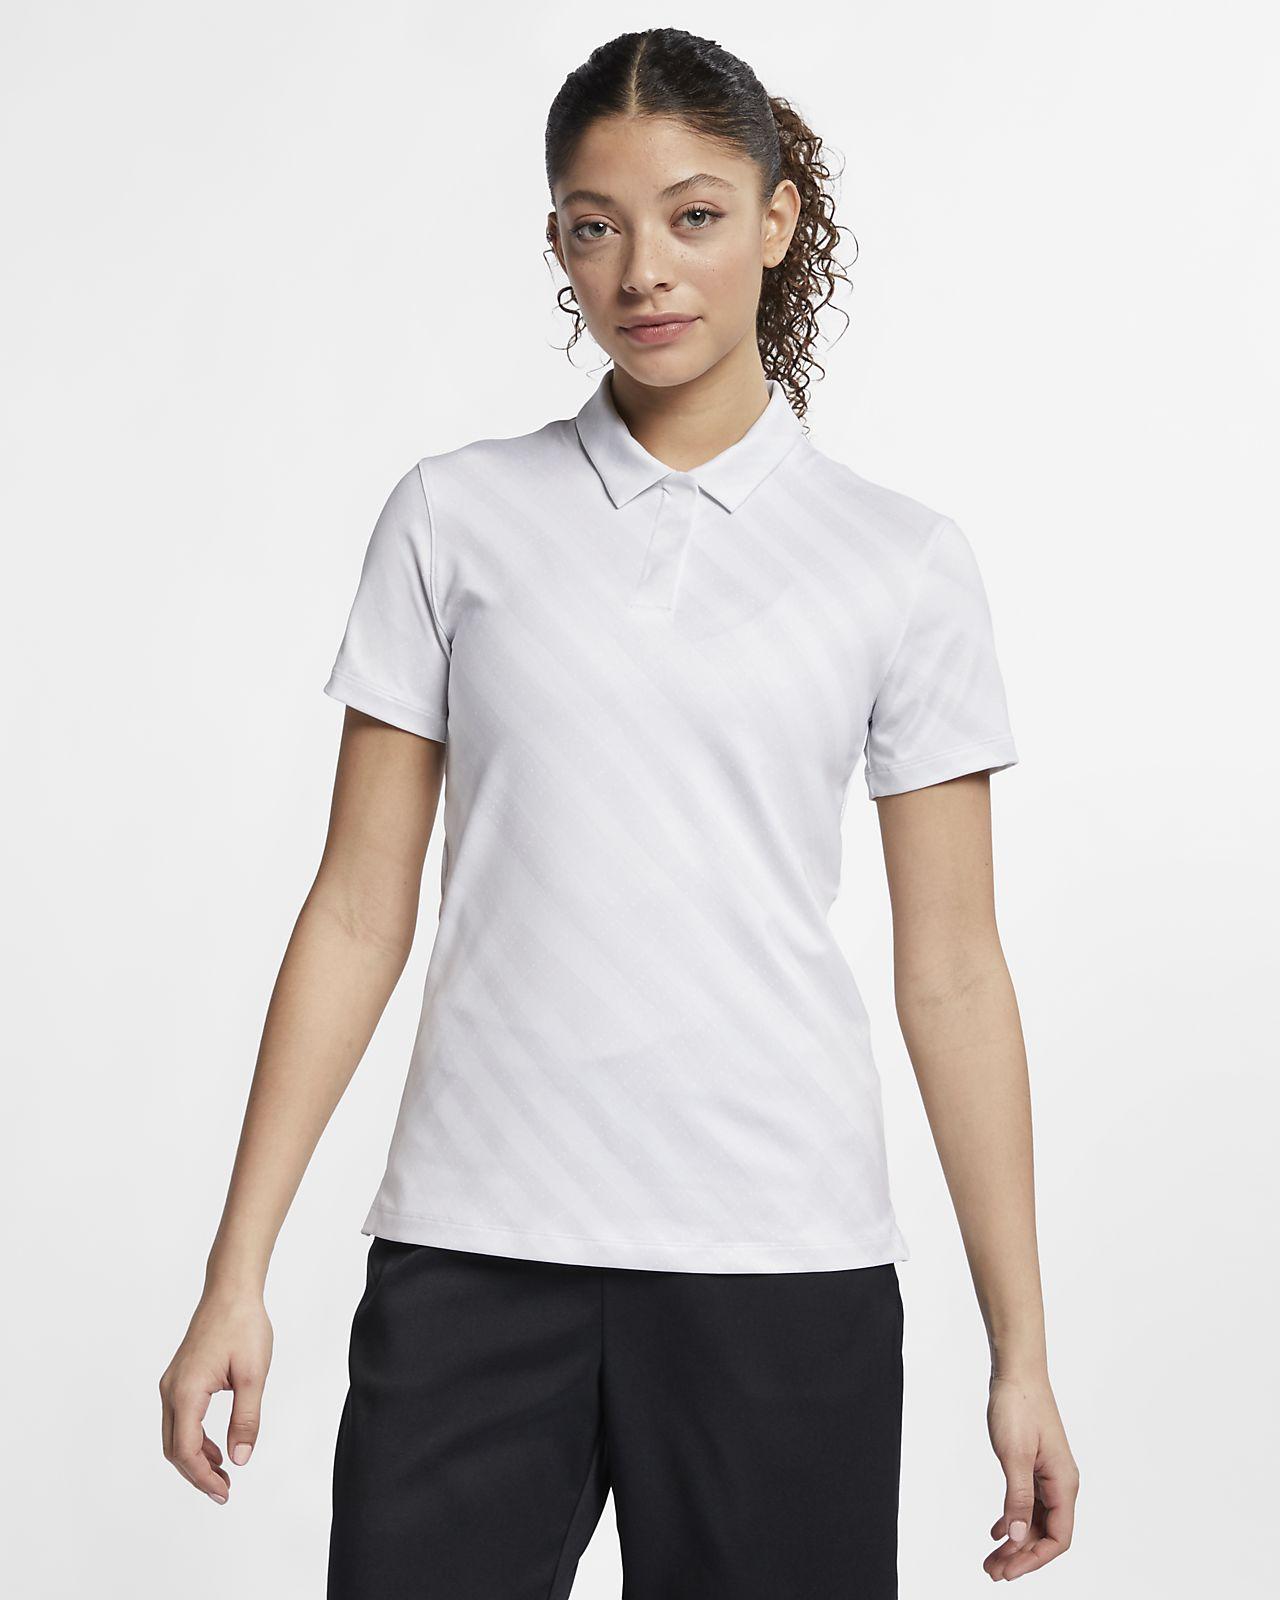 Nike Dri-FIT UV Polo de golf con estampado - Mujer